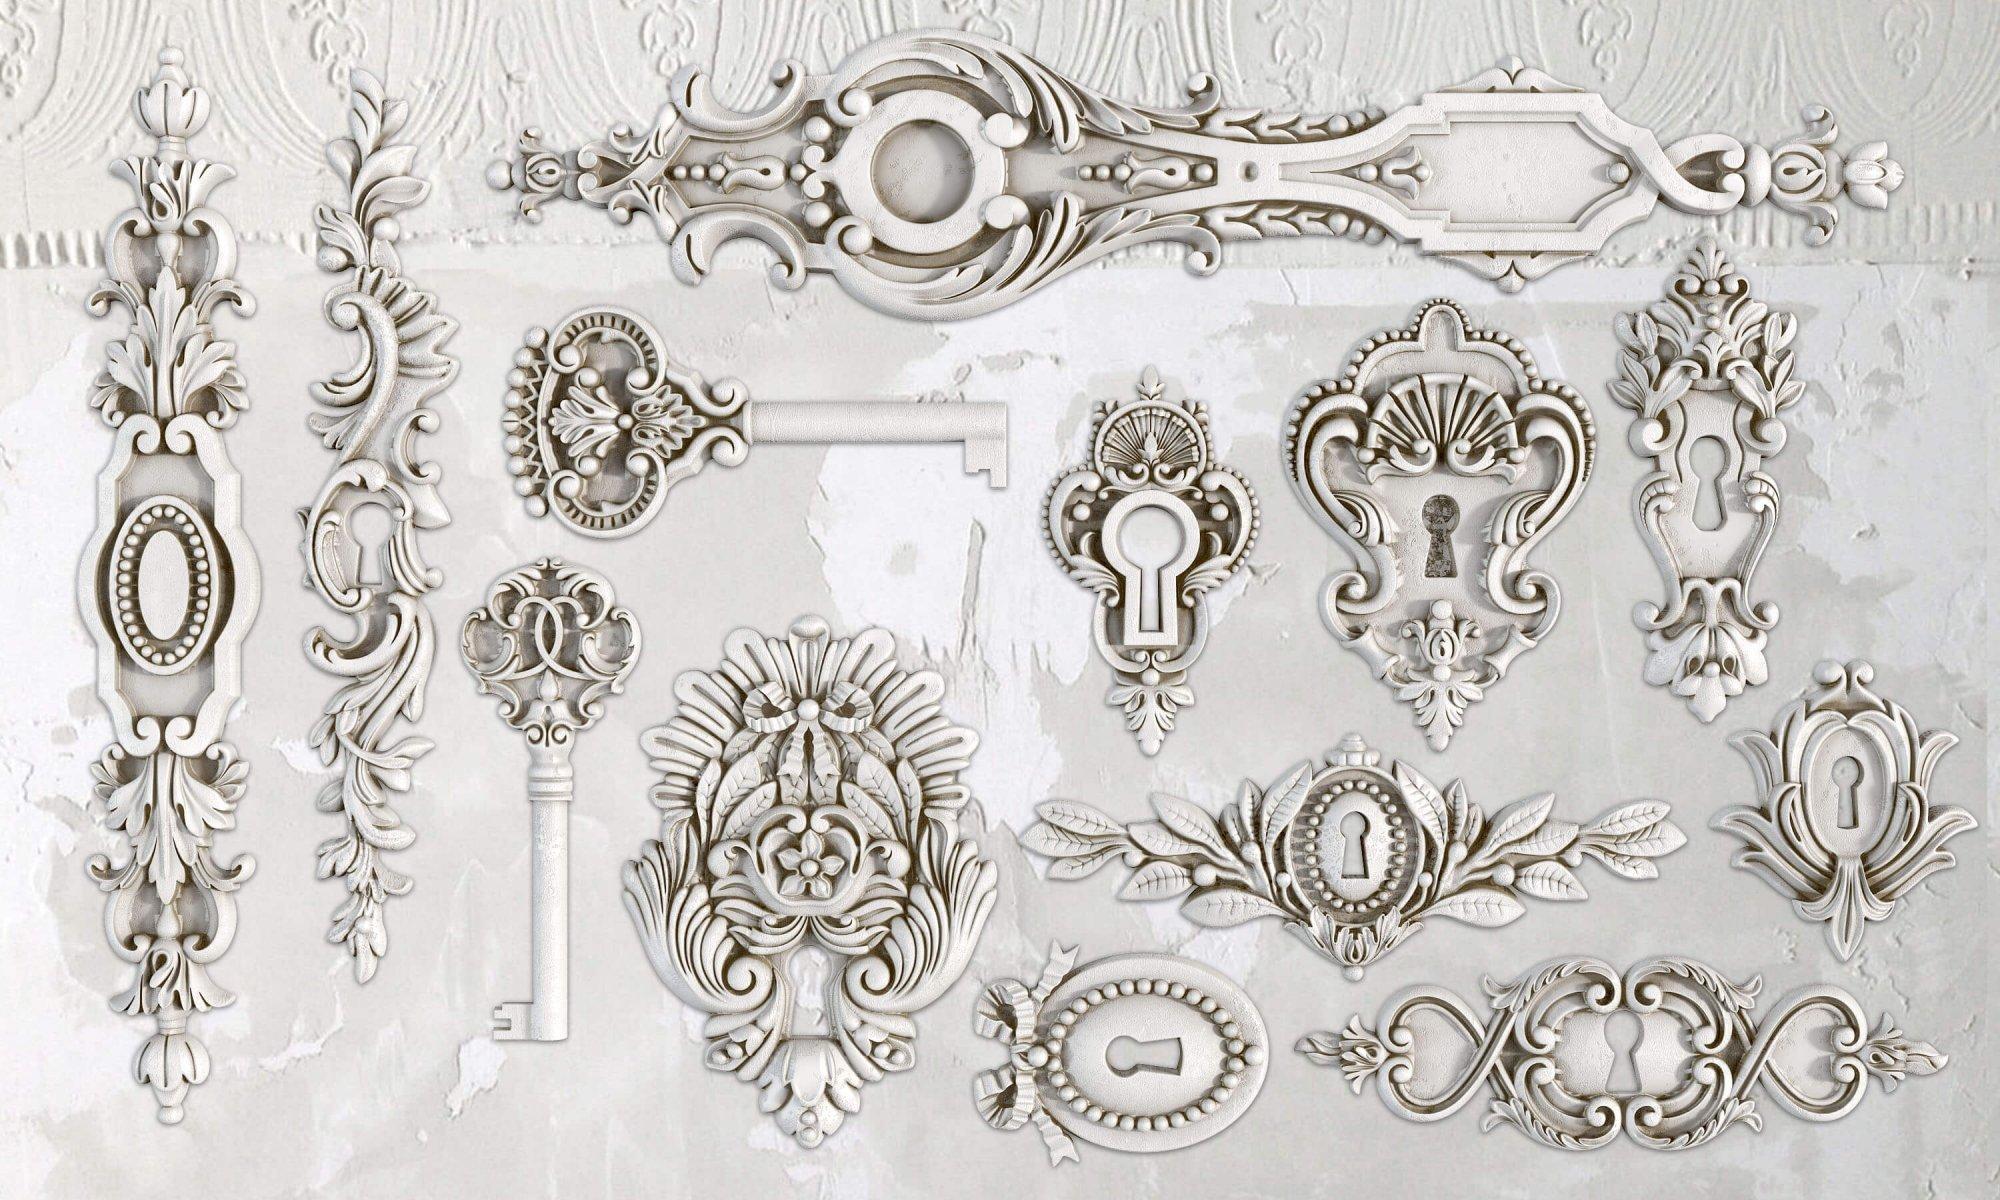 Lock & Key 6x10 IOD Decor Moulds